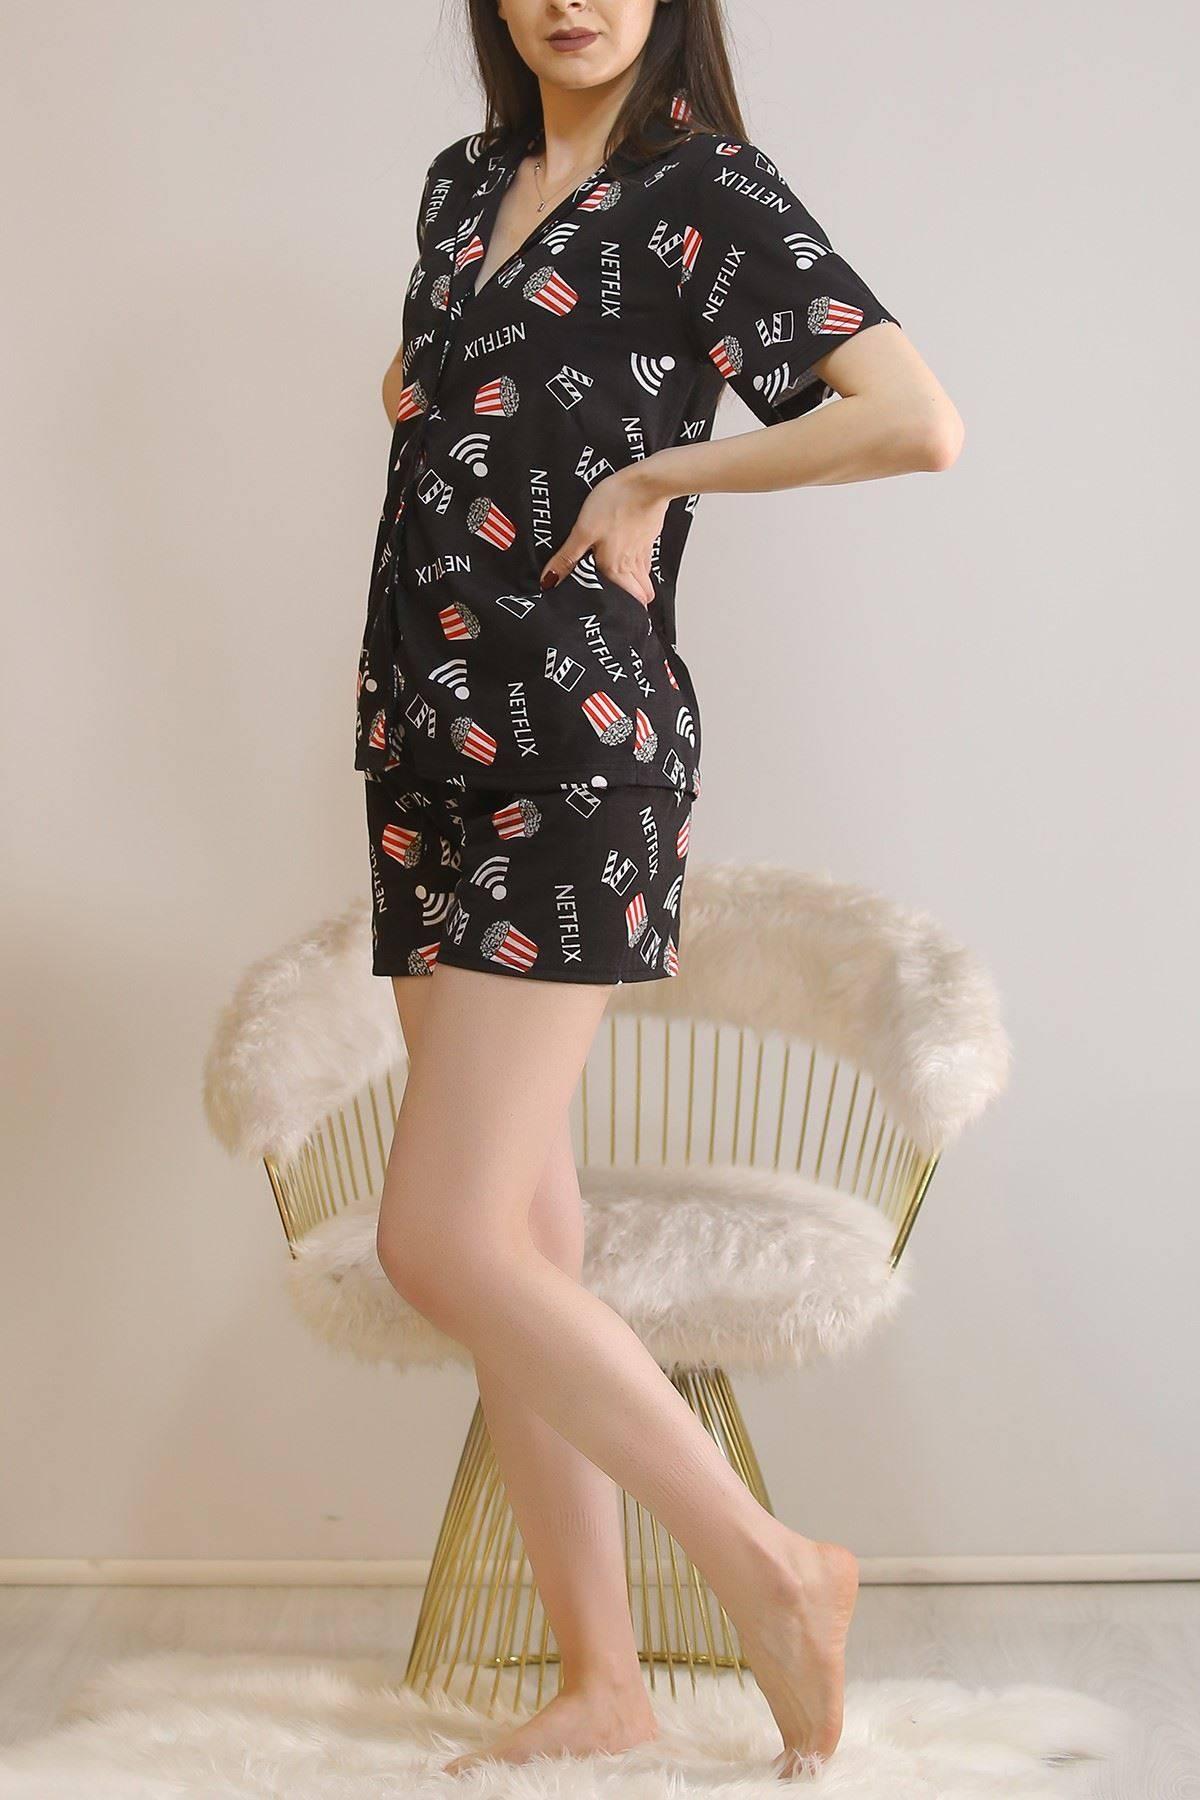 Şortlu Pijama Takımı Siyah - 5979.102.